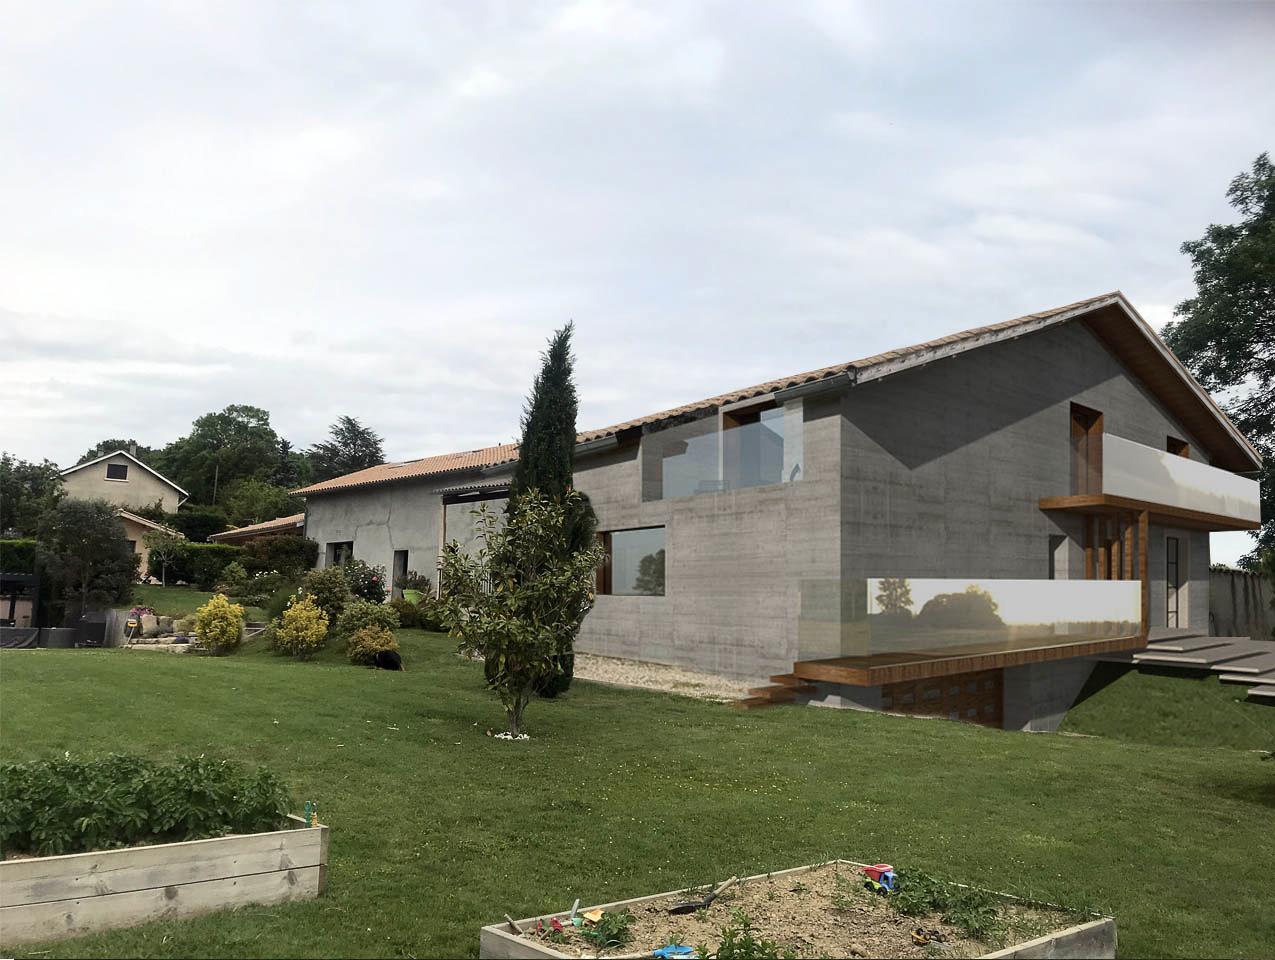 renover-rehabilitation-ferme-grange-architecte-façade-travaux-permis-de-construire-7